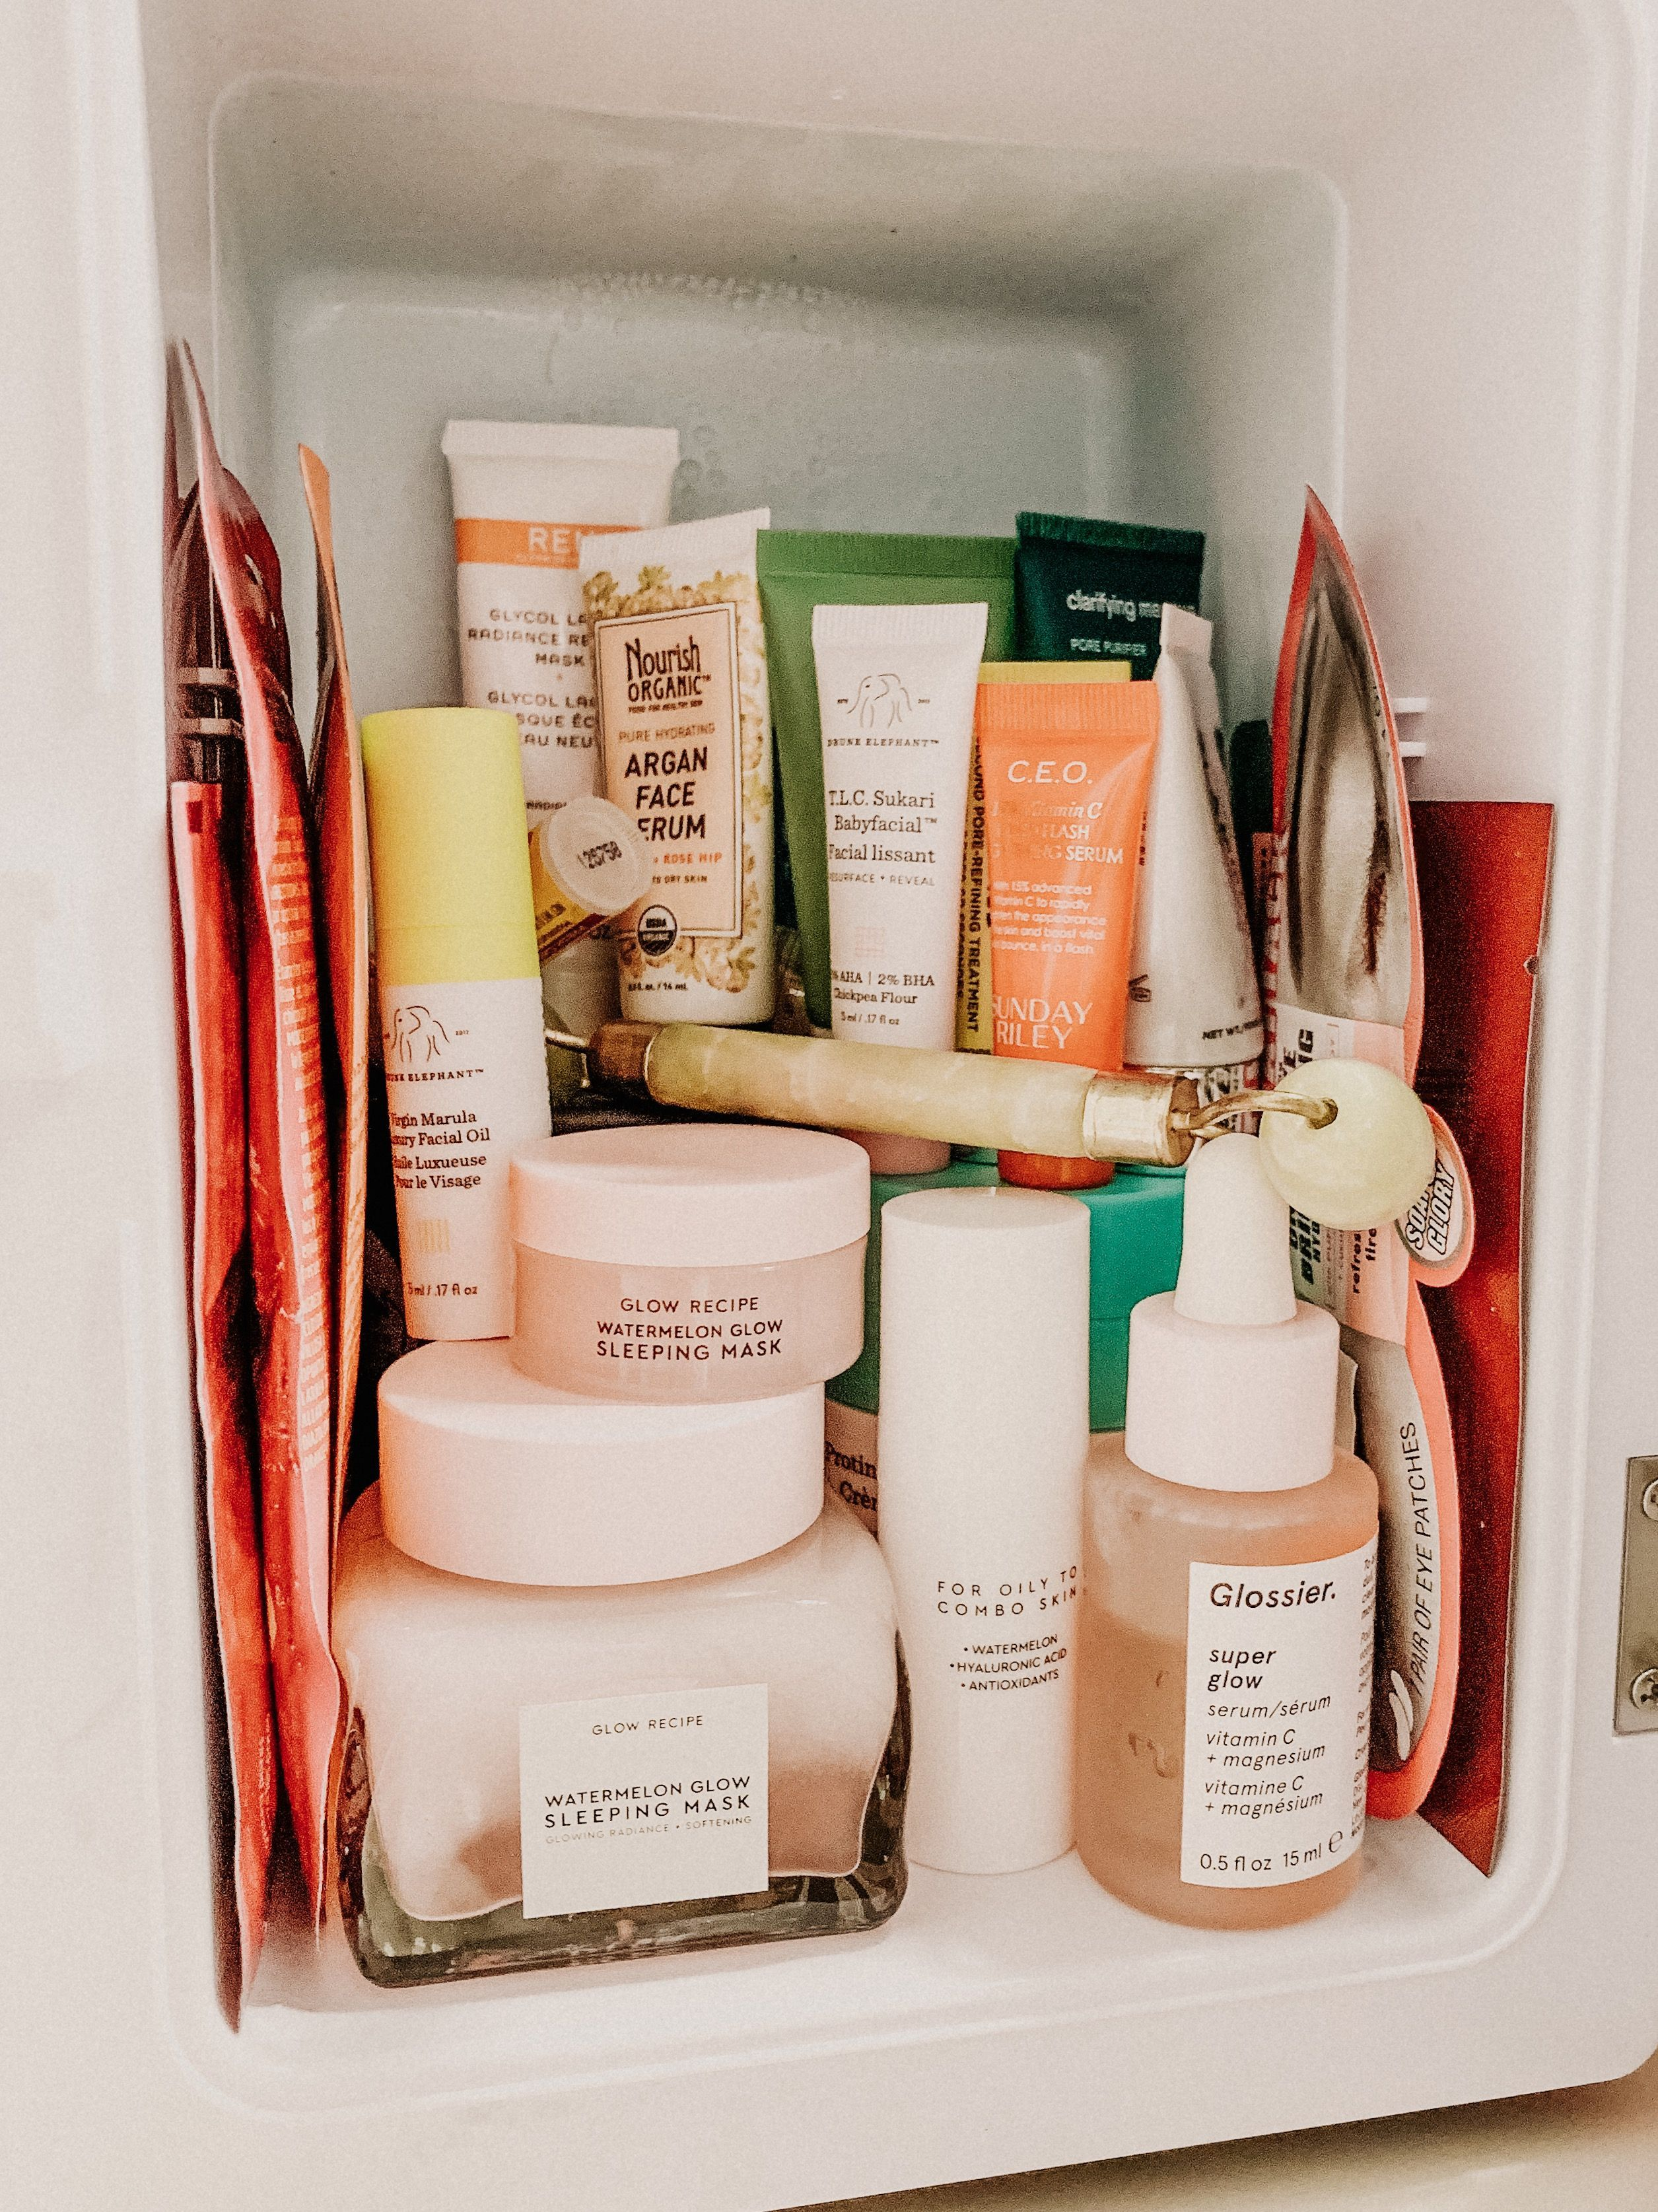 Skin Care Fridge Organic Skin Care Routine Skin Care Women Skin Care Toner Products